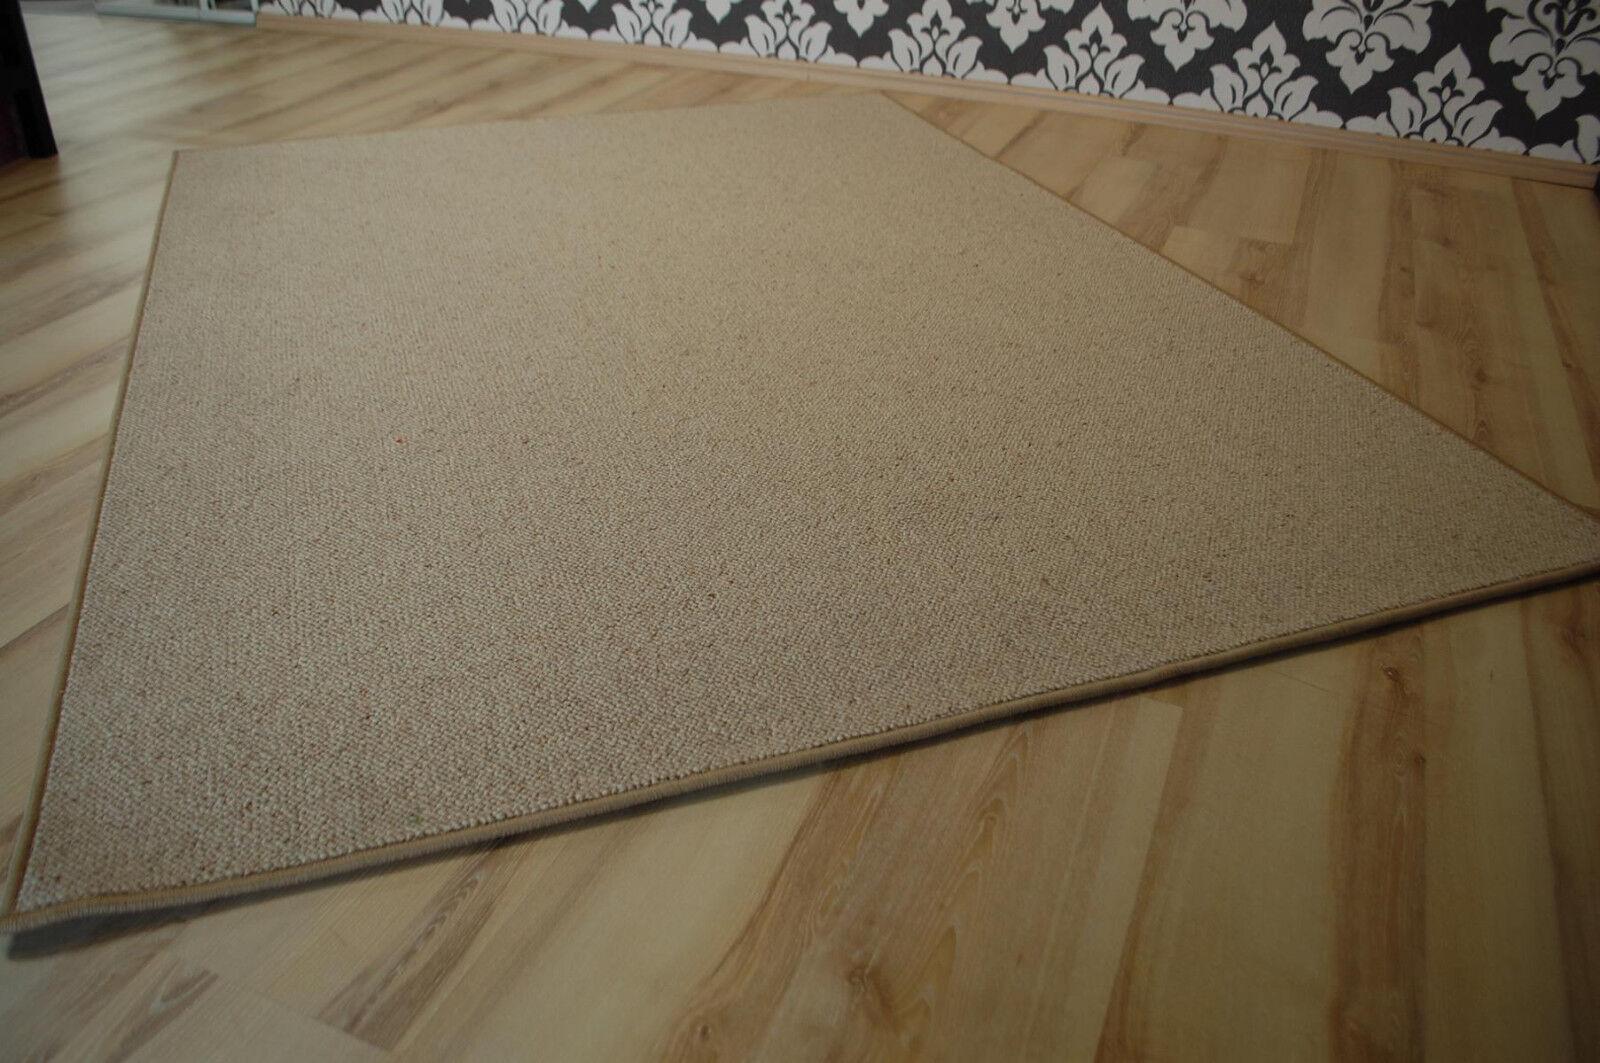 Laine Tapis laine umkettelt Beige 150 x 200 cm 100% laine Tapis gekettelt 54c7da